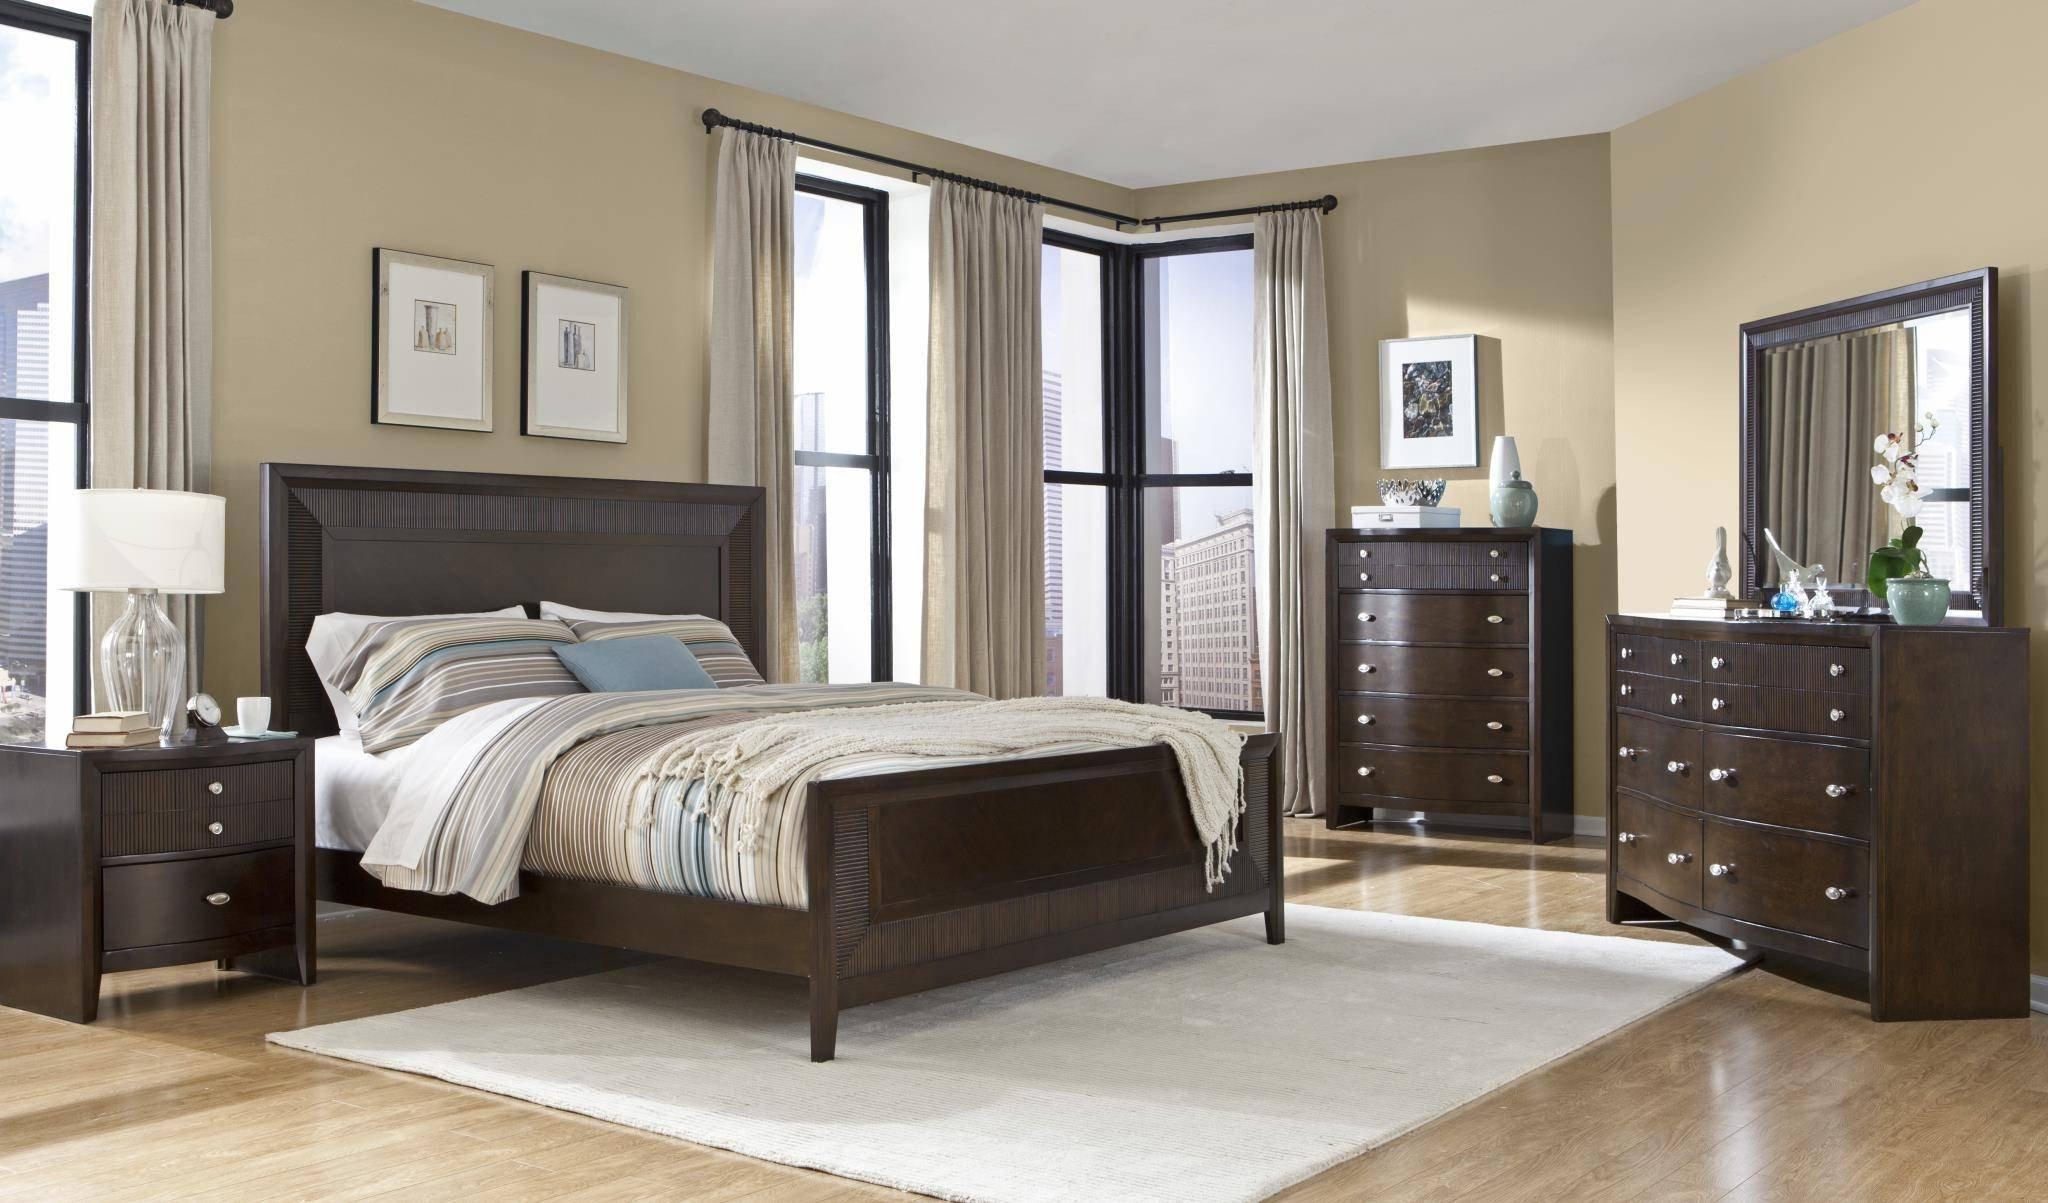 Espresso King Bedroom Set Luxury Myco Furniture Em3111k Empire Espresso Finish Ribbed Wood King Panel Bedroom Set 4pcs